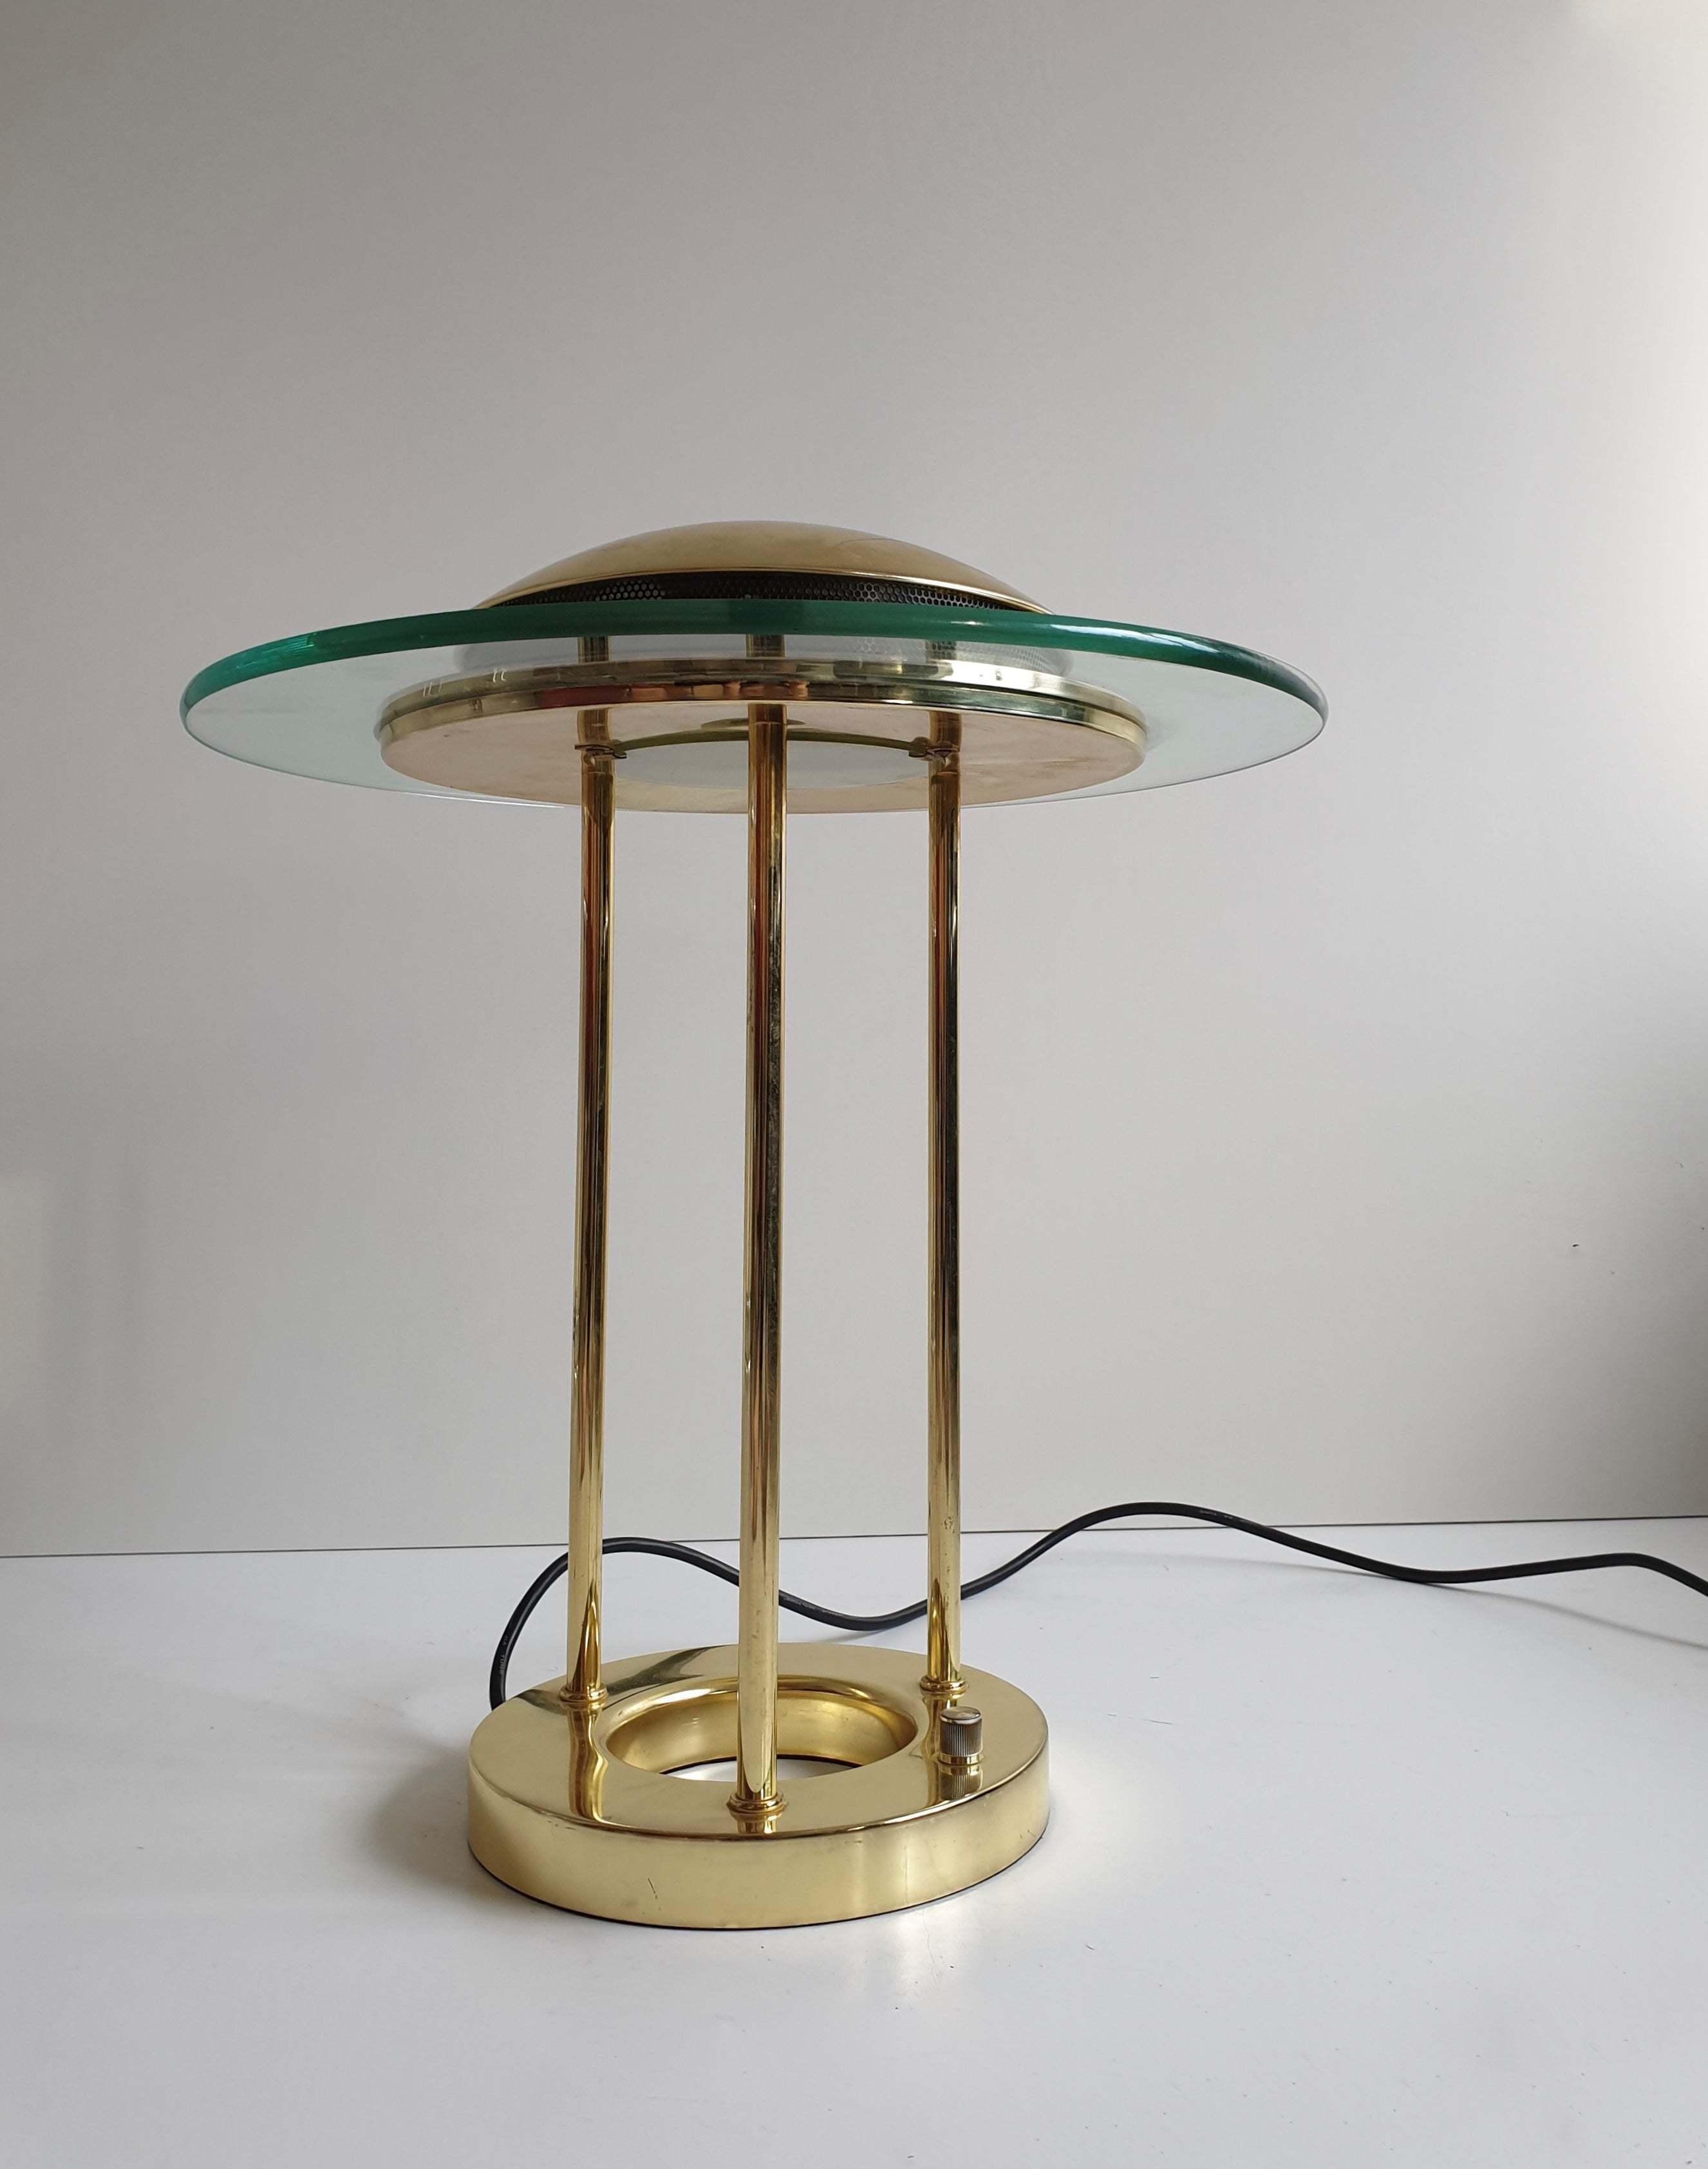 Vintage Brass 'Saturn' Desk Lamp By R. Sonneman For George Kovacs, C.1980